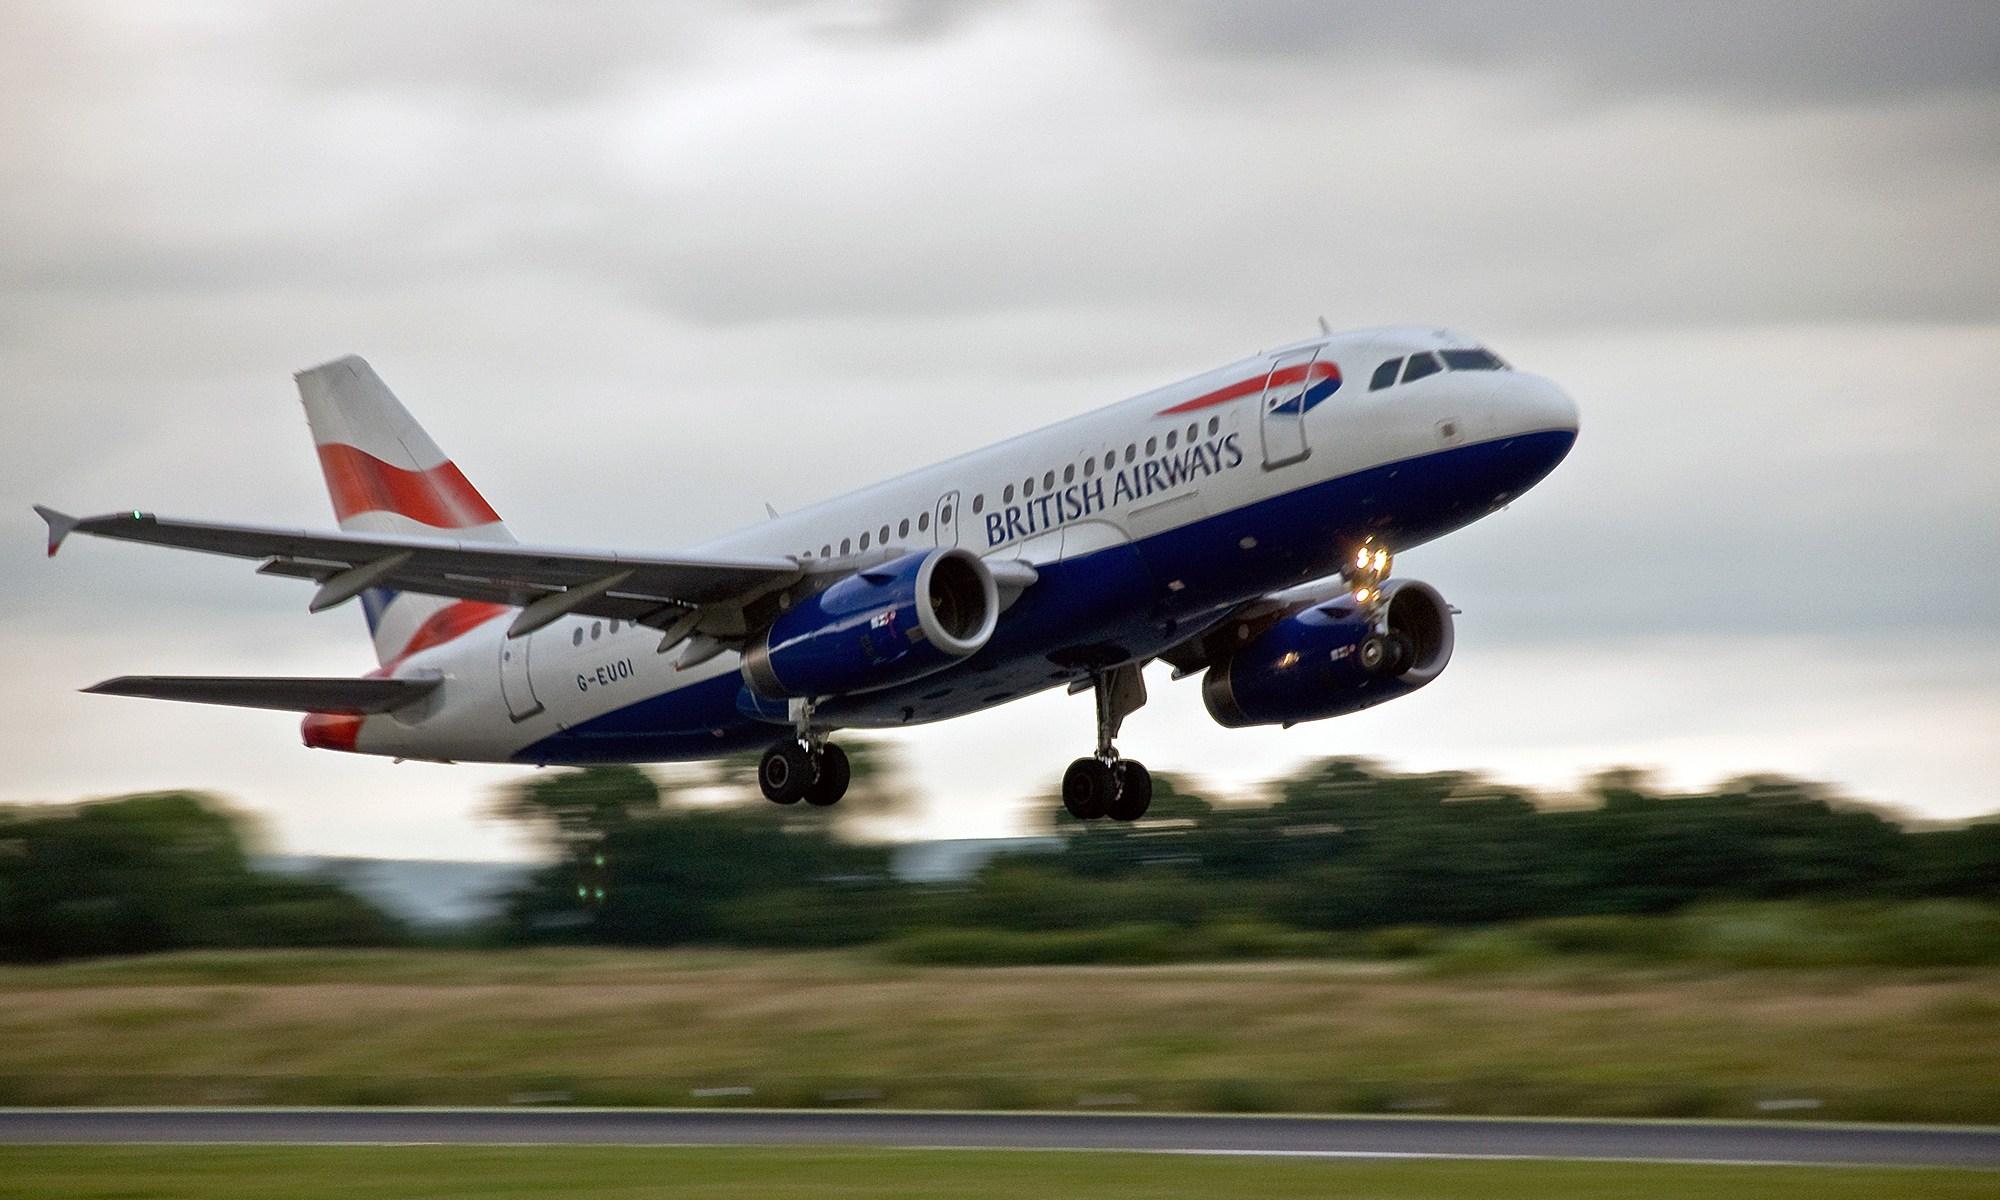 British Airways Airbus A319 taking off